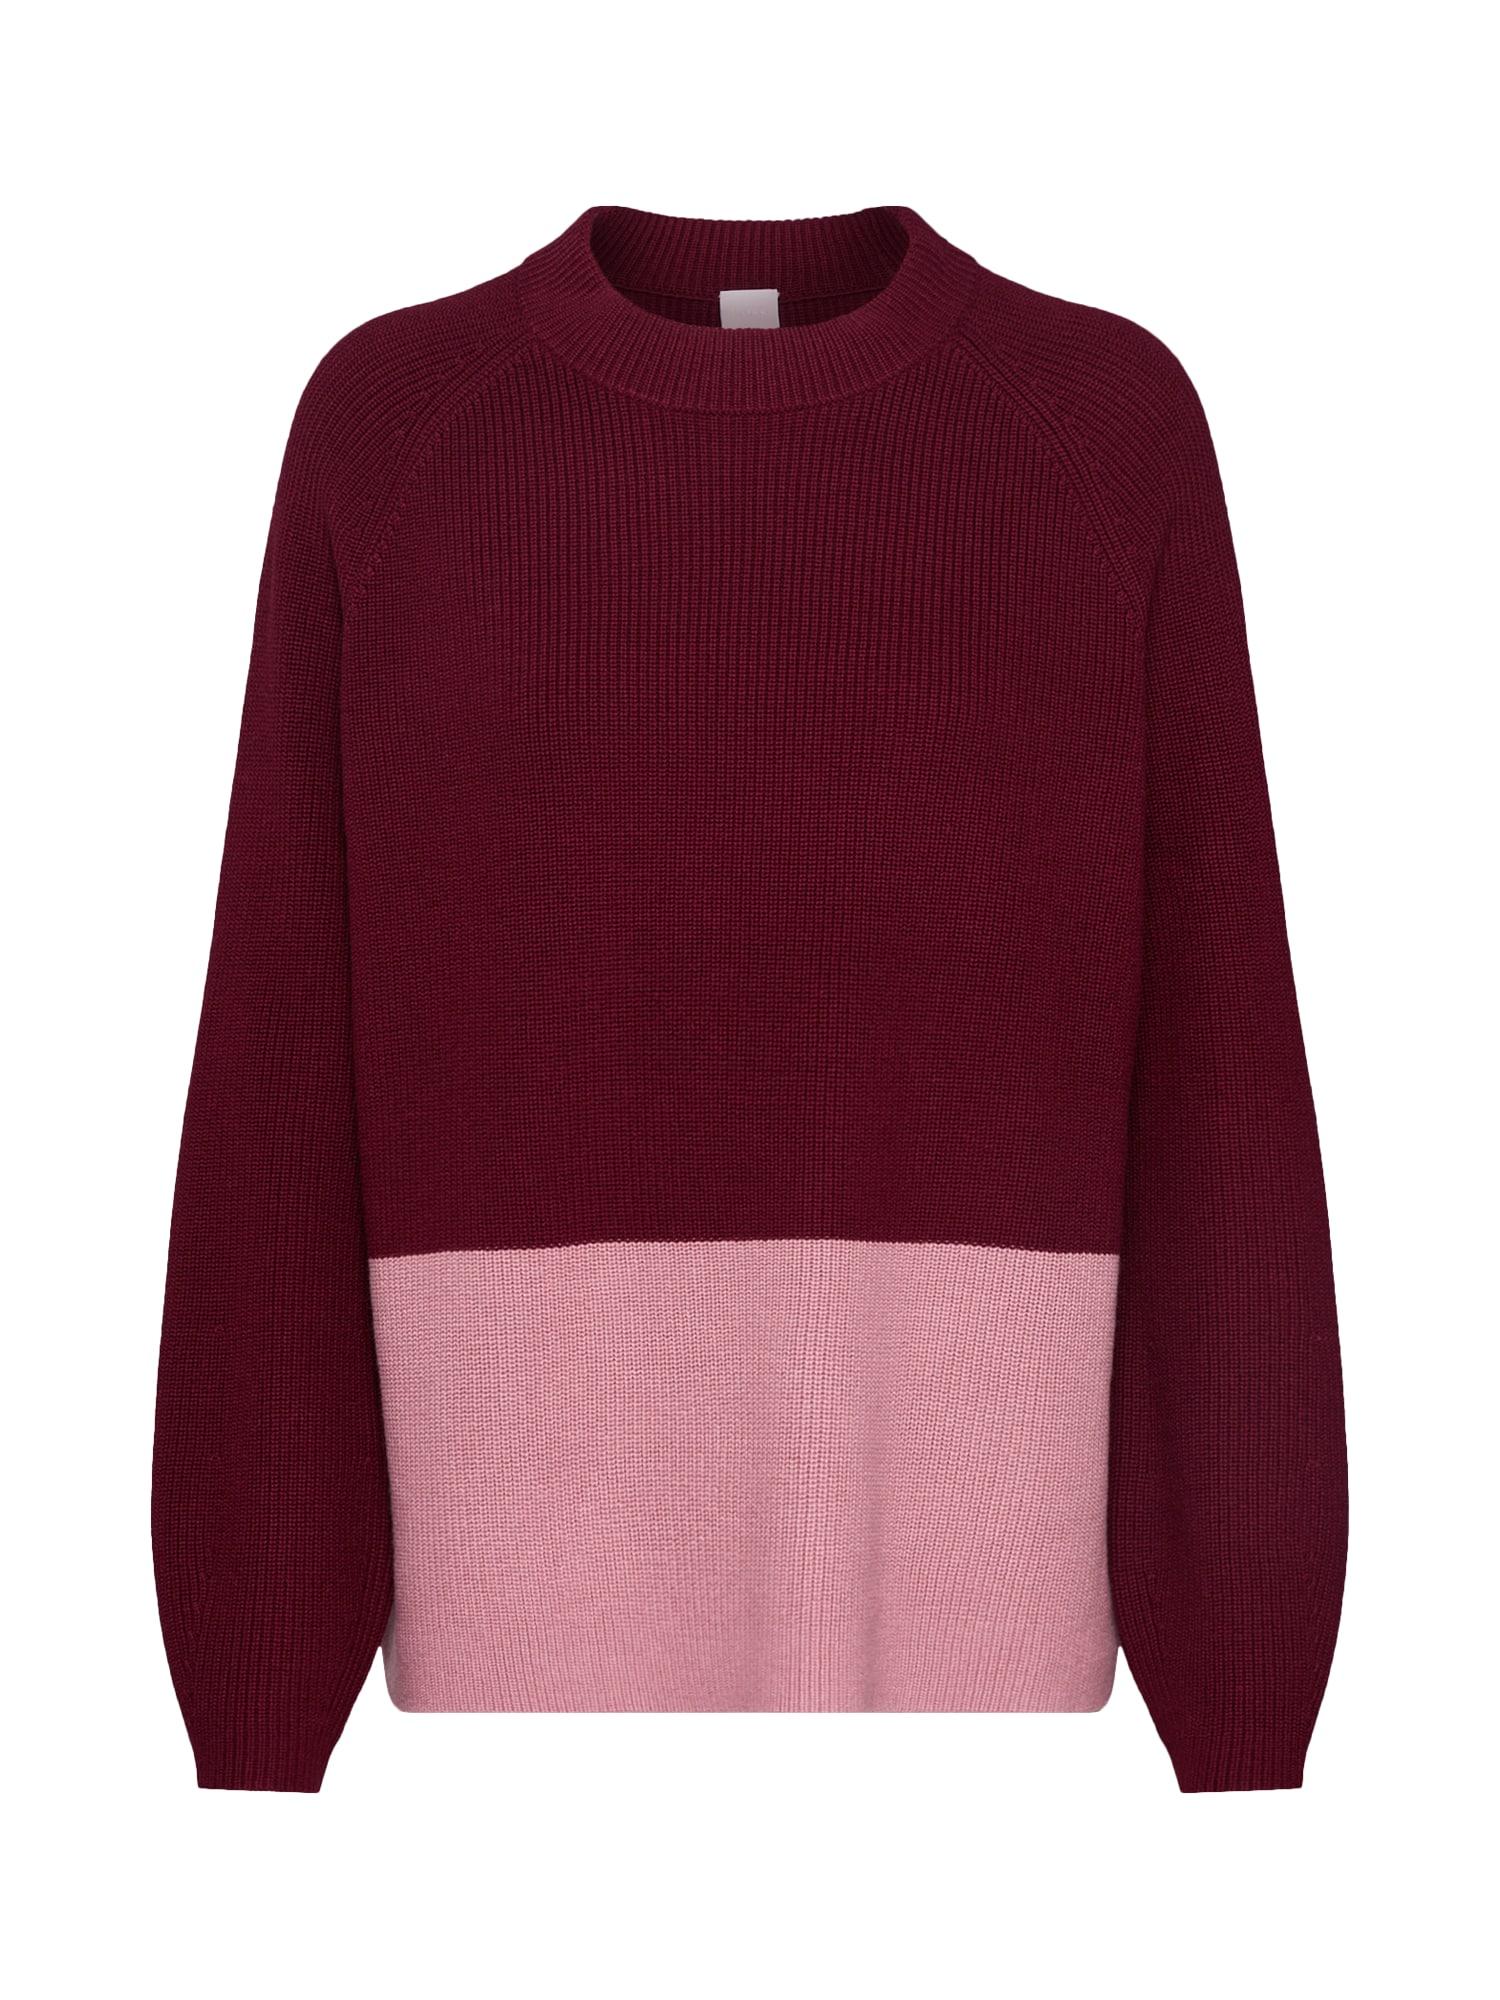 BOSS Megztinis 'Wenevery' raudona